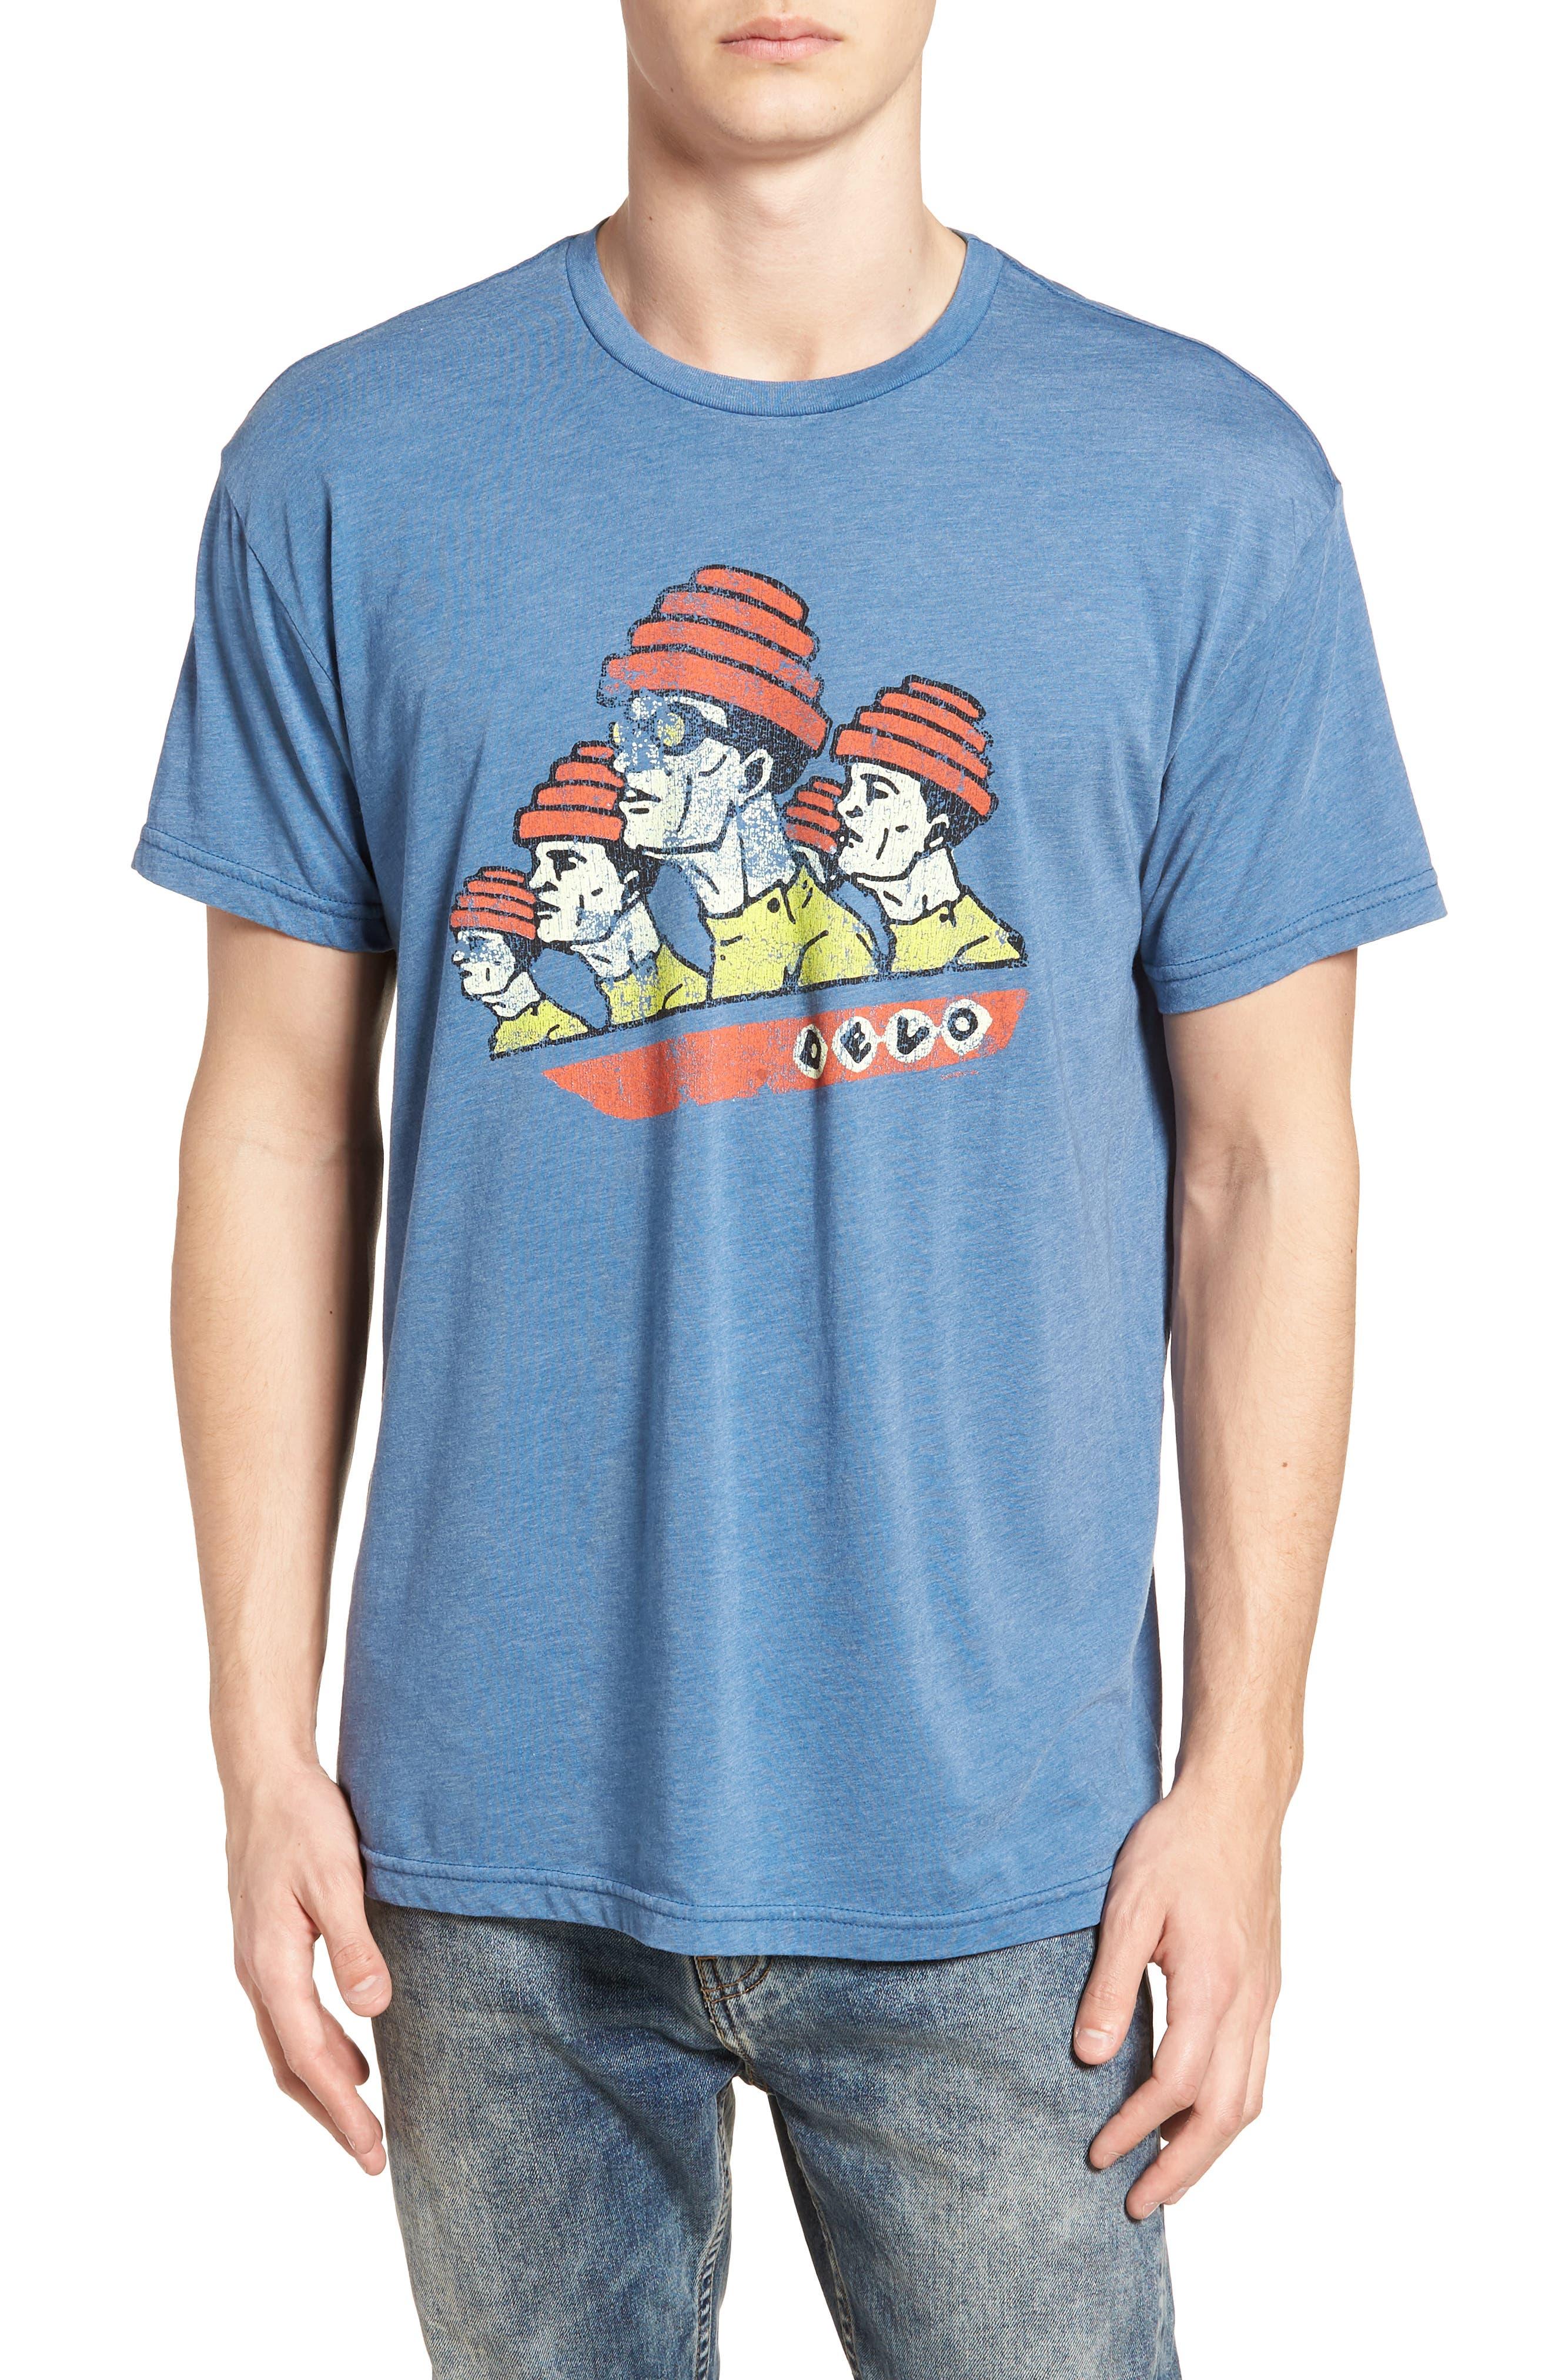 Devo Graphic T-Shirt,                             Main thumbnail 1, color,                             Heather Blue